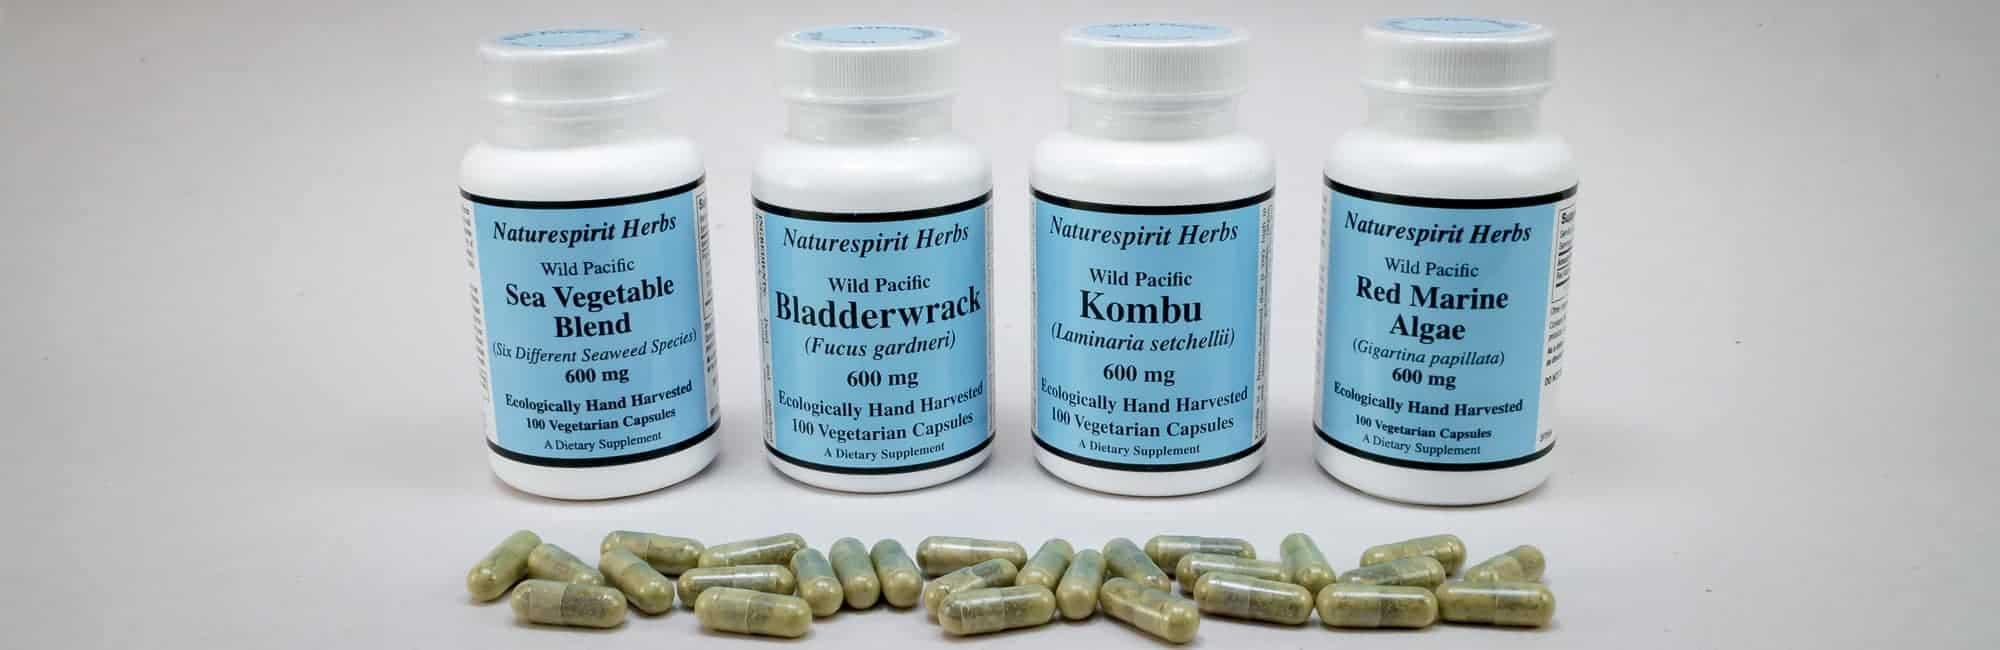 Pure Seaweed Capsules Hero 2 - Naturespirit Herbs Seaweed Capsules